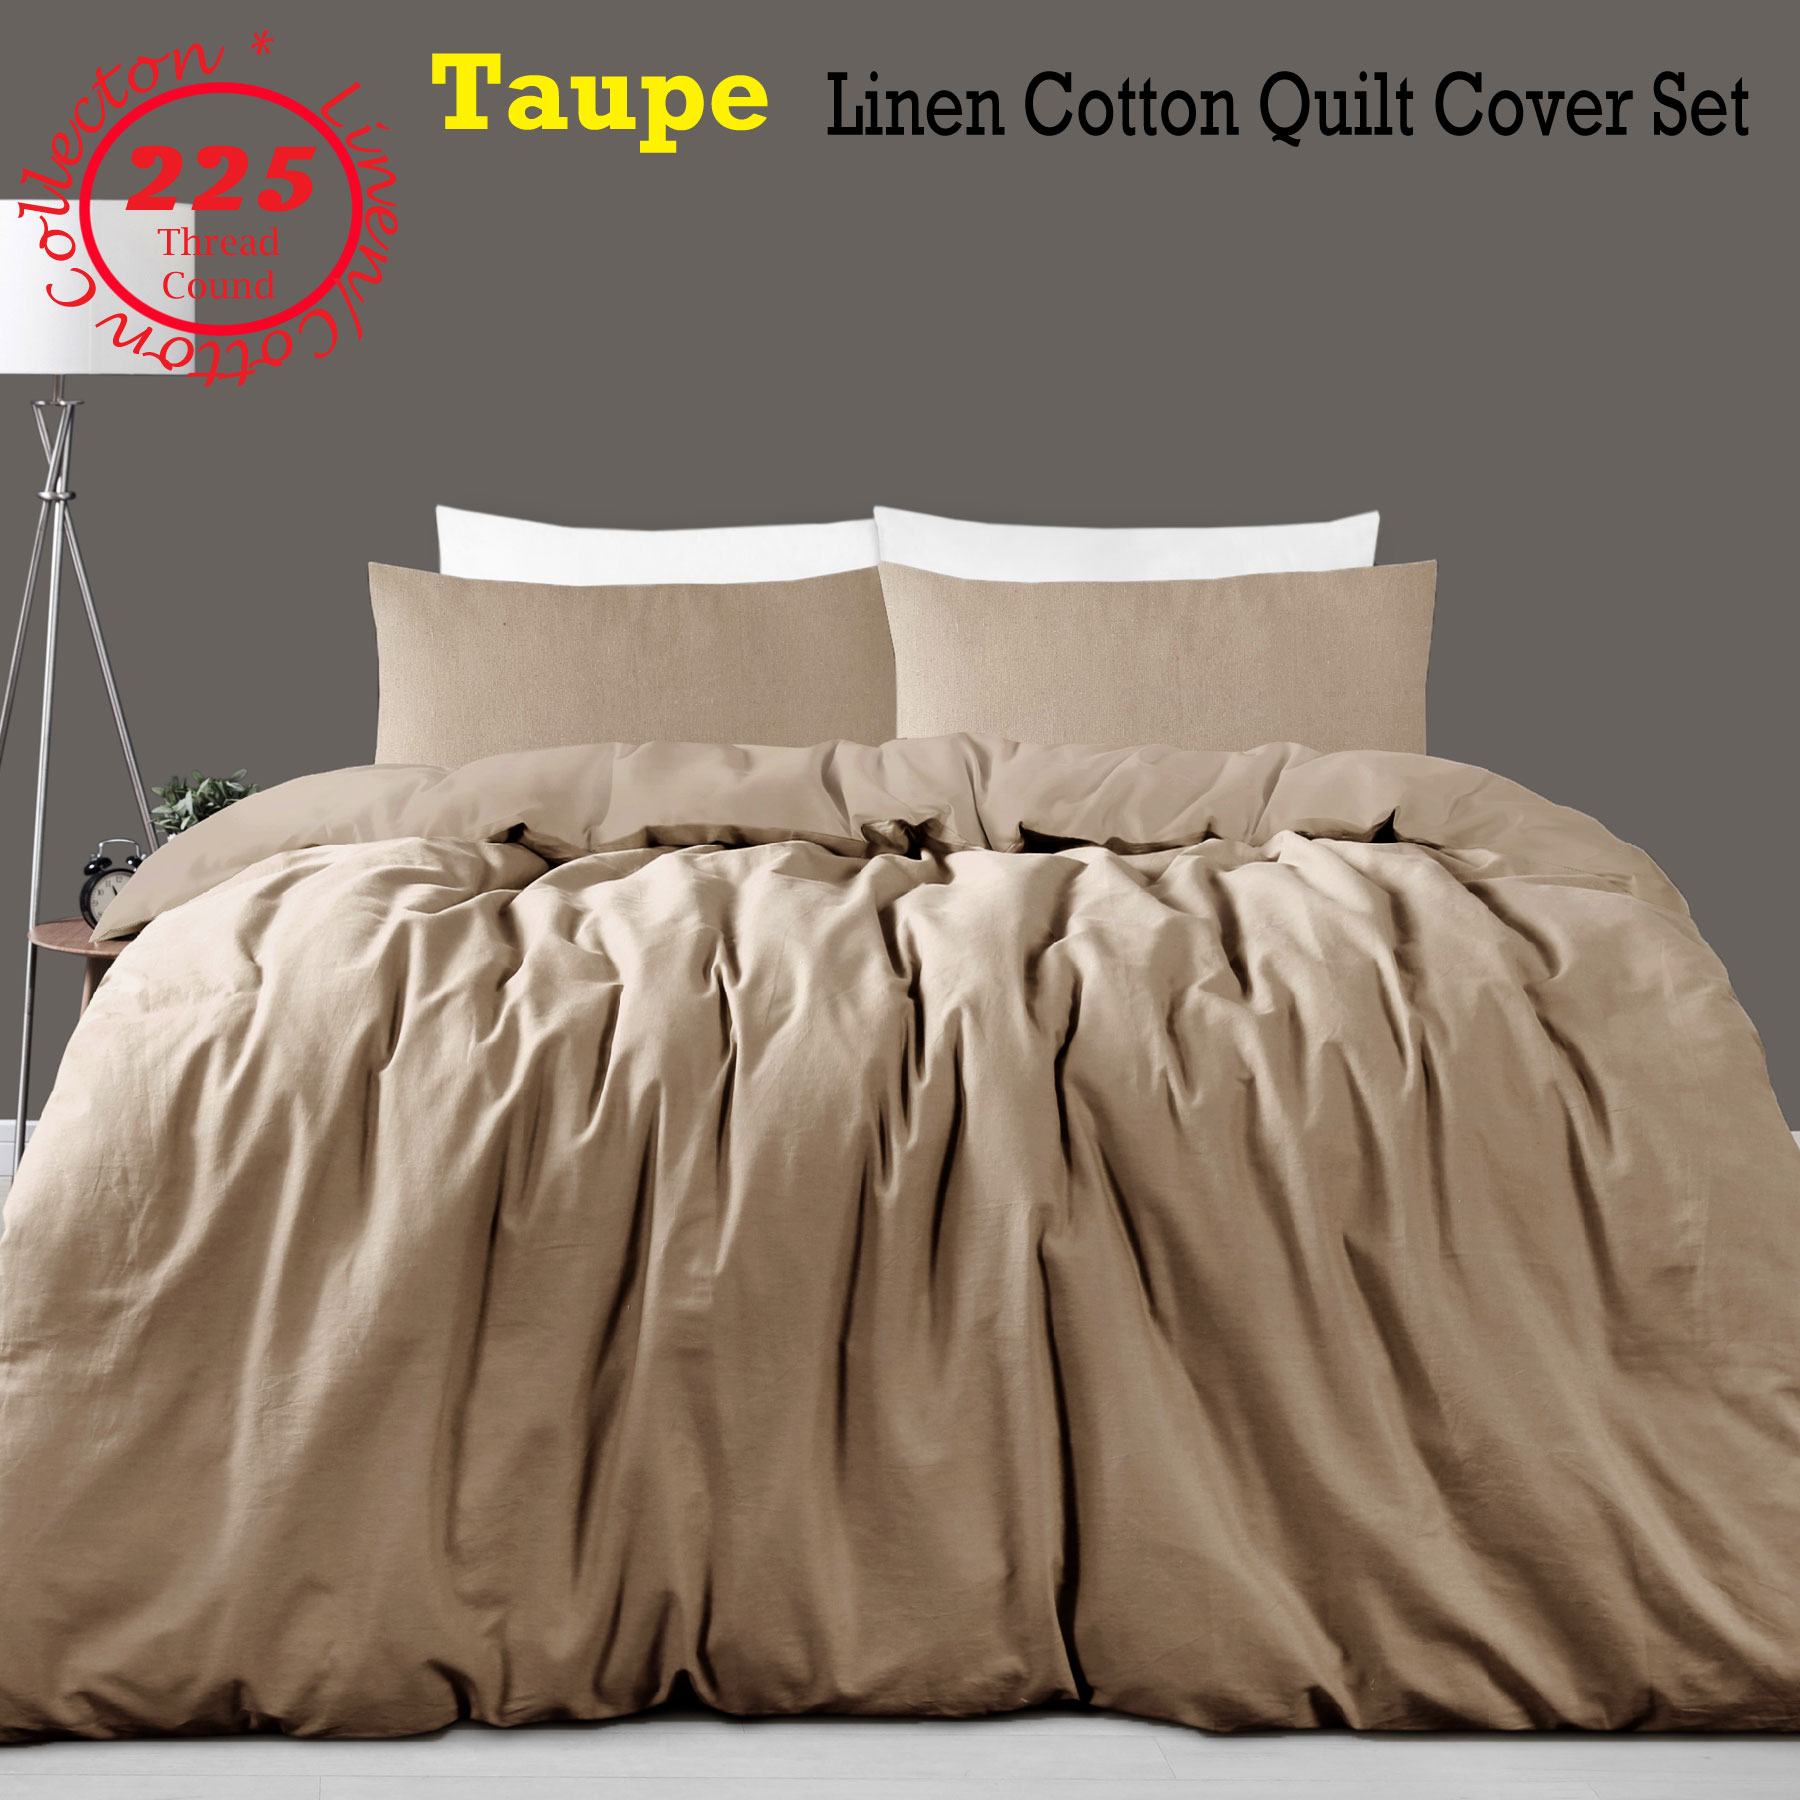 3 Pce 225tc Linen Cotton Taupe Quilt Doona Duvet Cover Set Queen King Super King Ebay